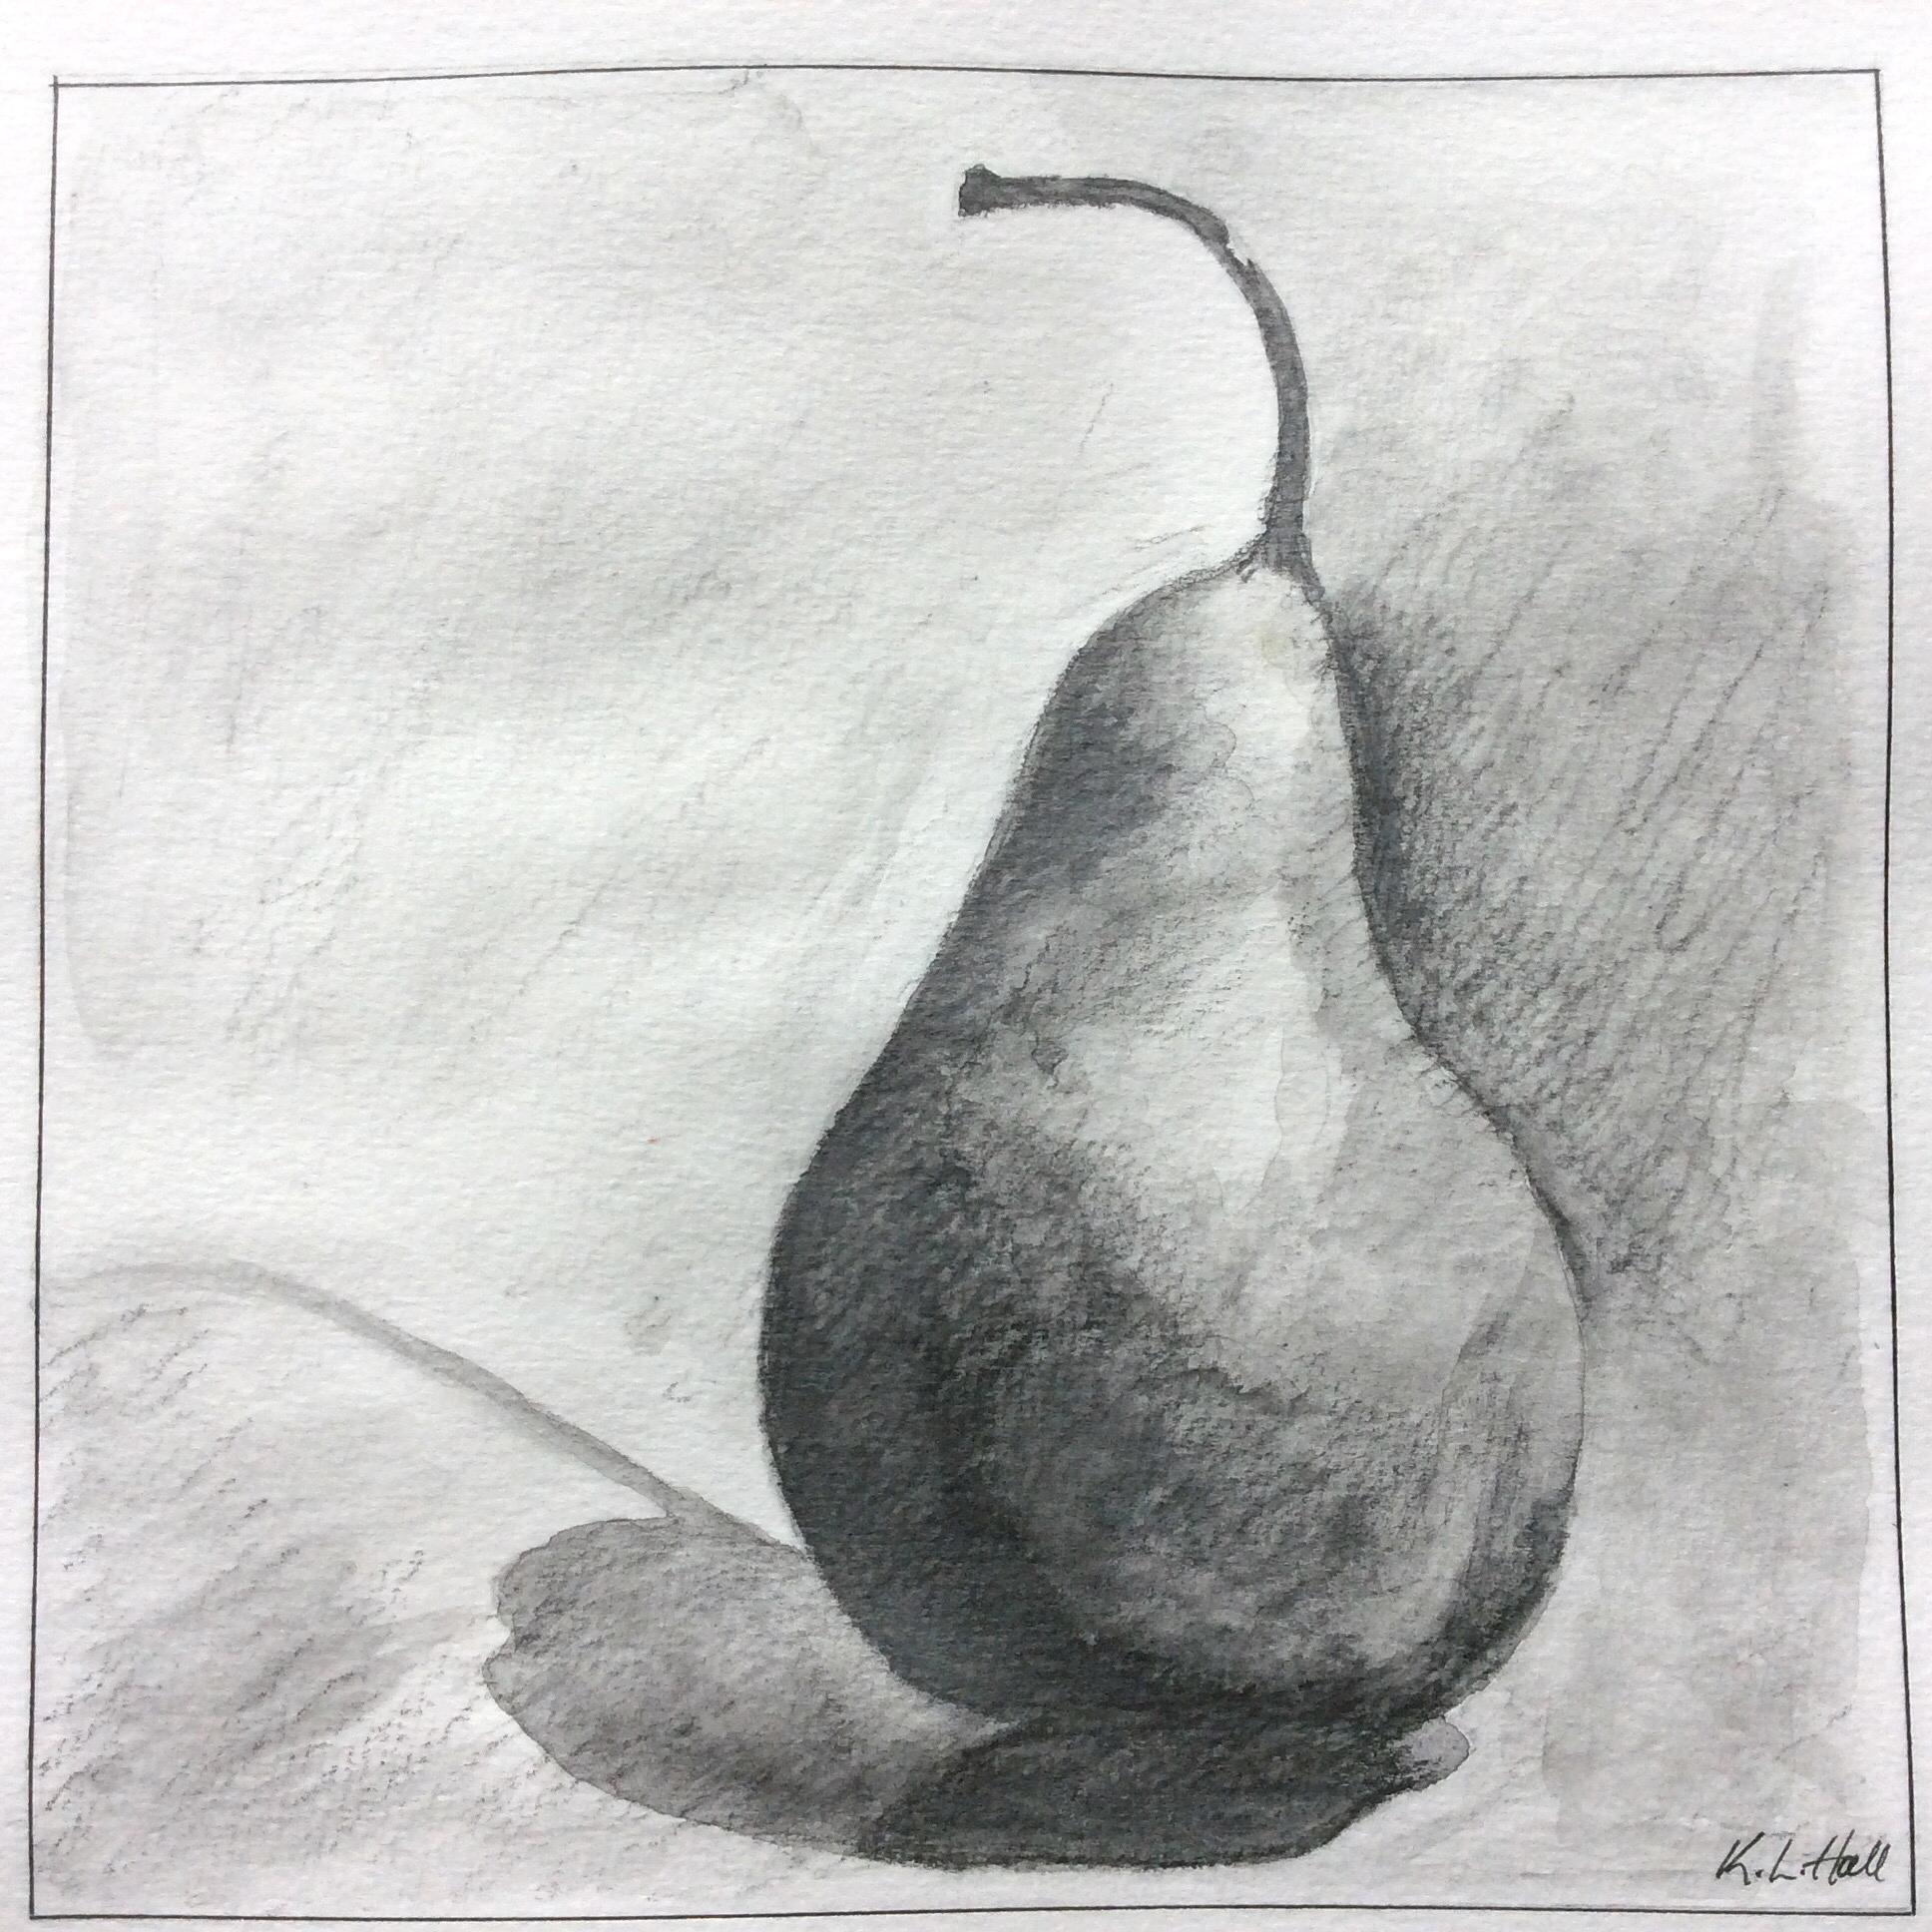 Art journal, water-soluble pencils